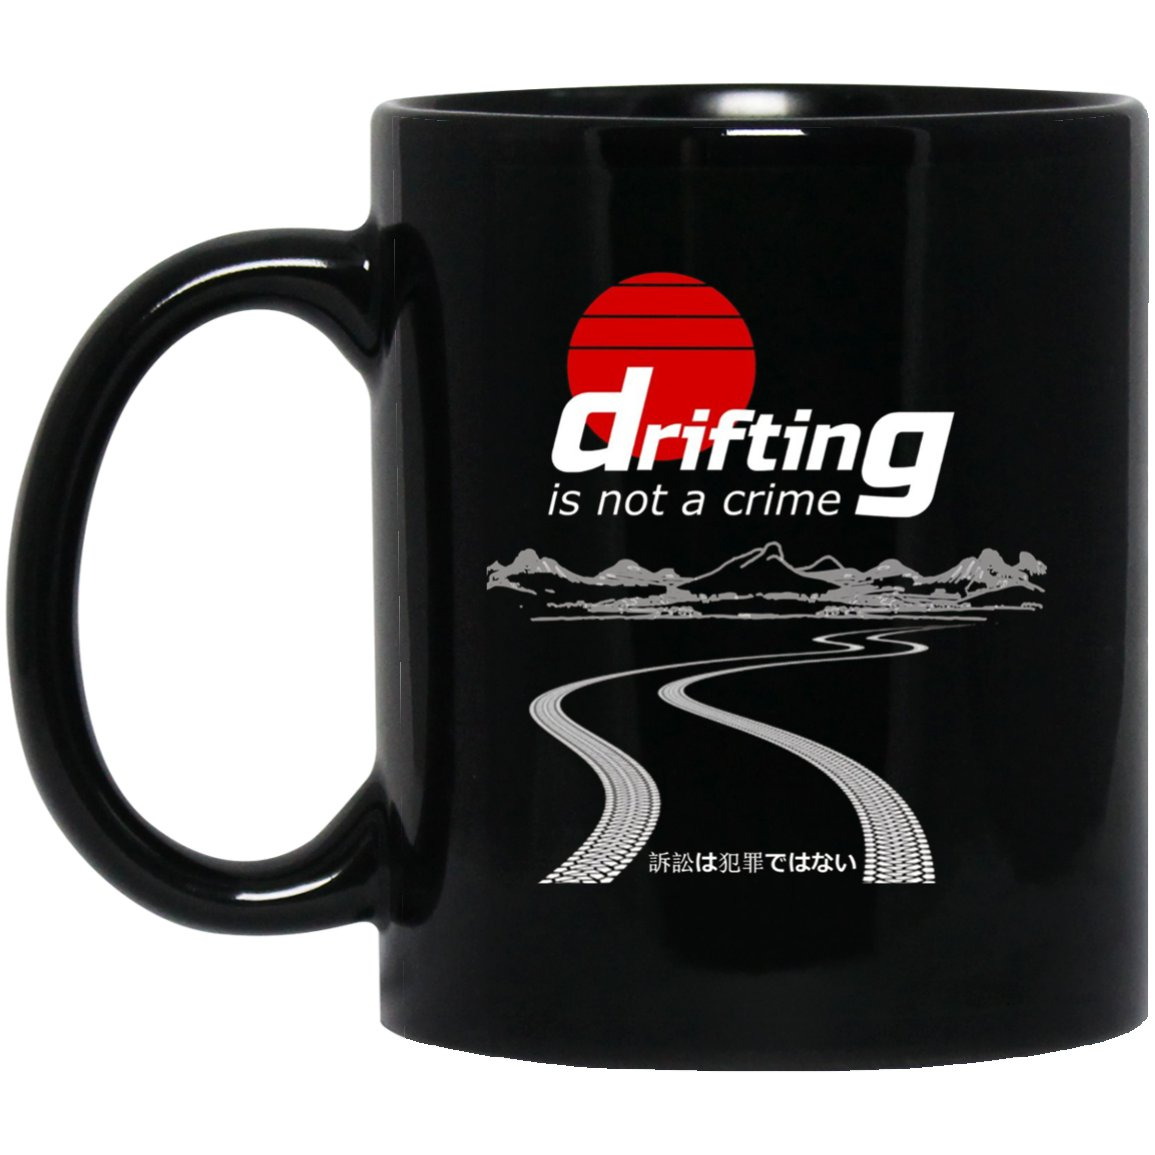 Drifting Is NOT a Crime Drifter Car T Black  Mug Black Ceramic 11oz Coffee Tea Cup